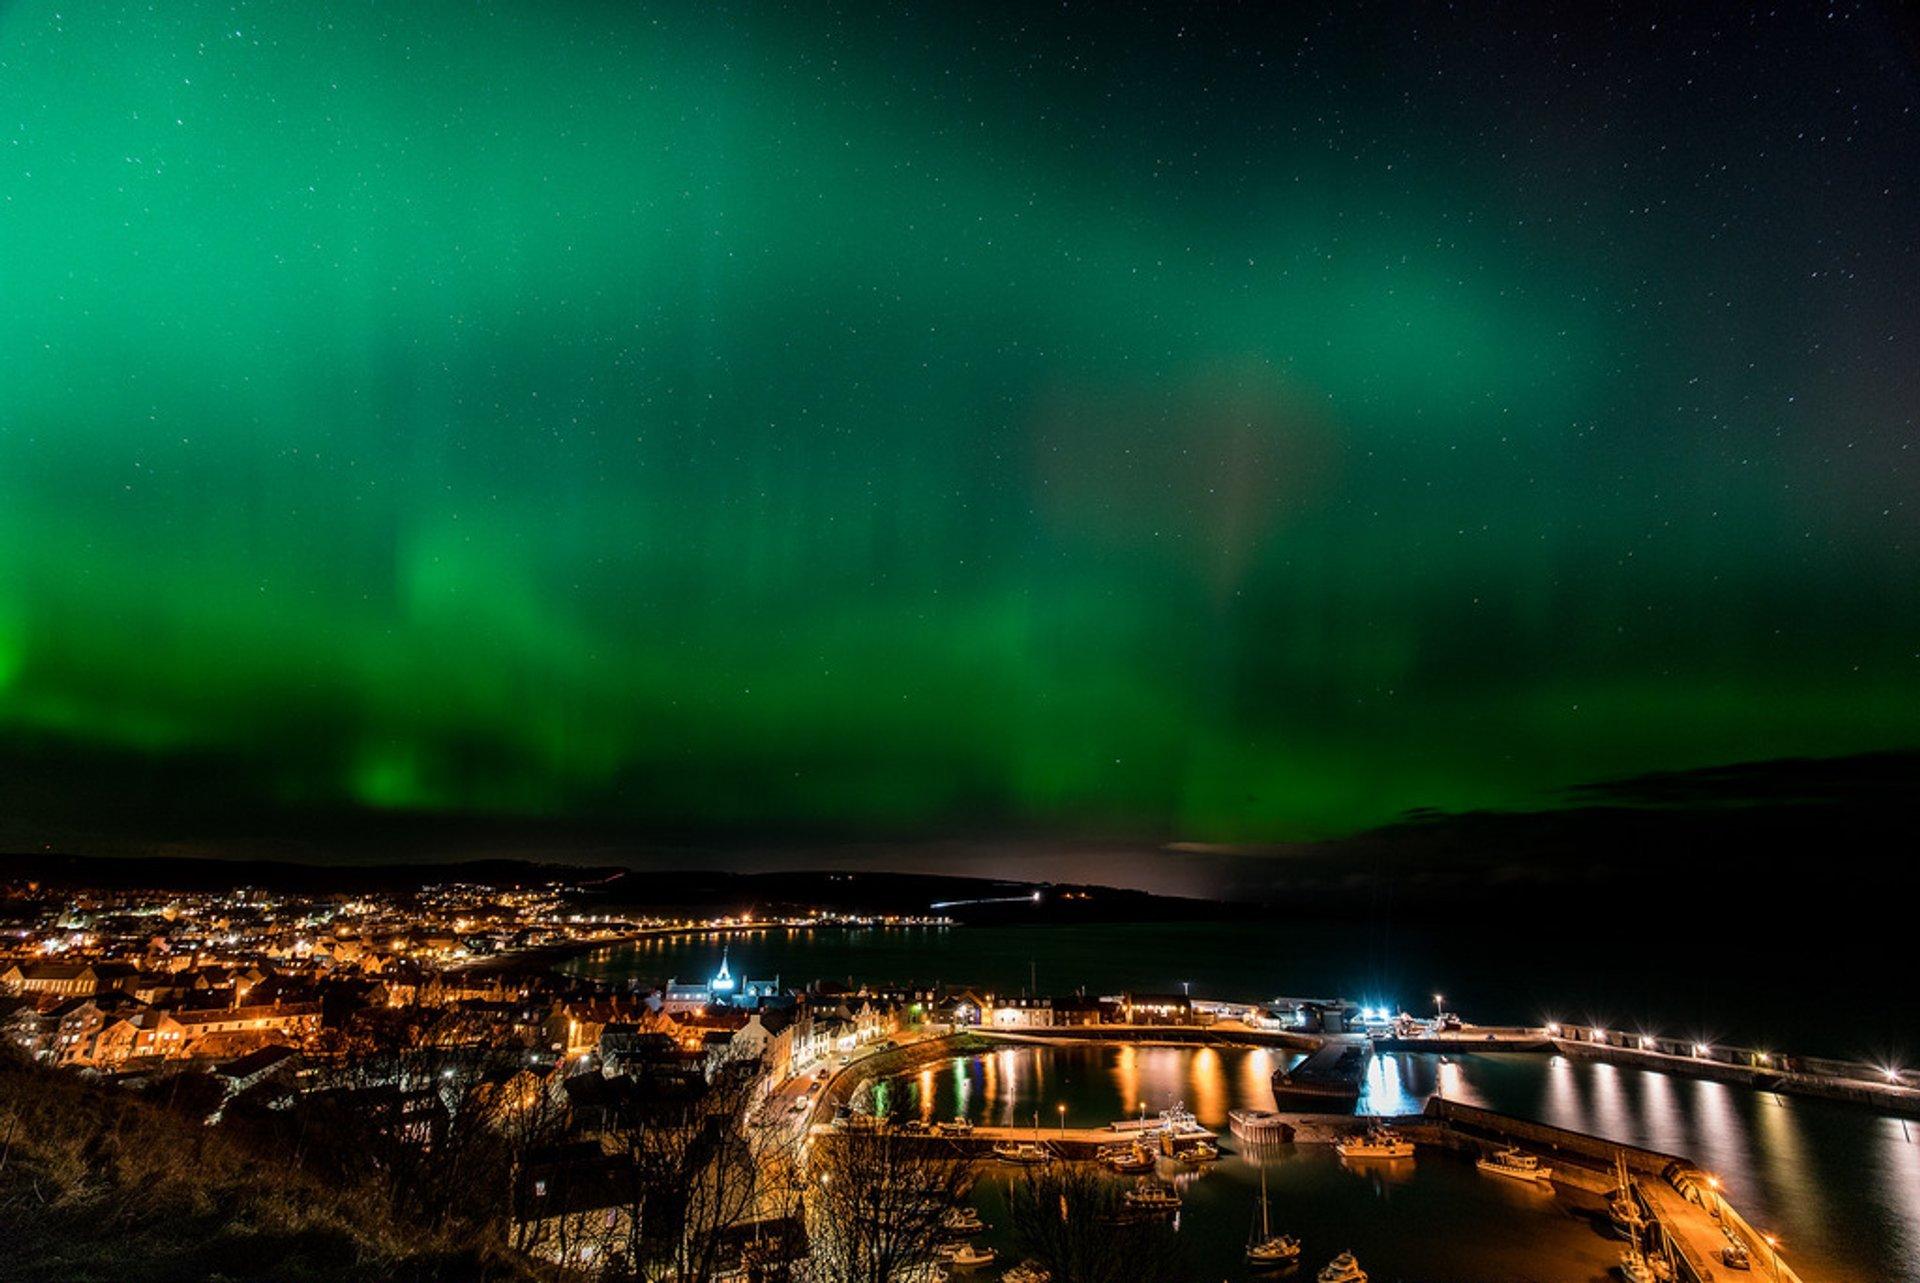 Aurora Borealis over Aberdeenshire, Scotland 2019